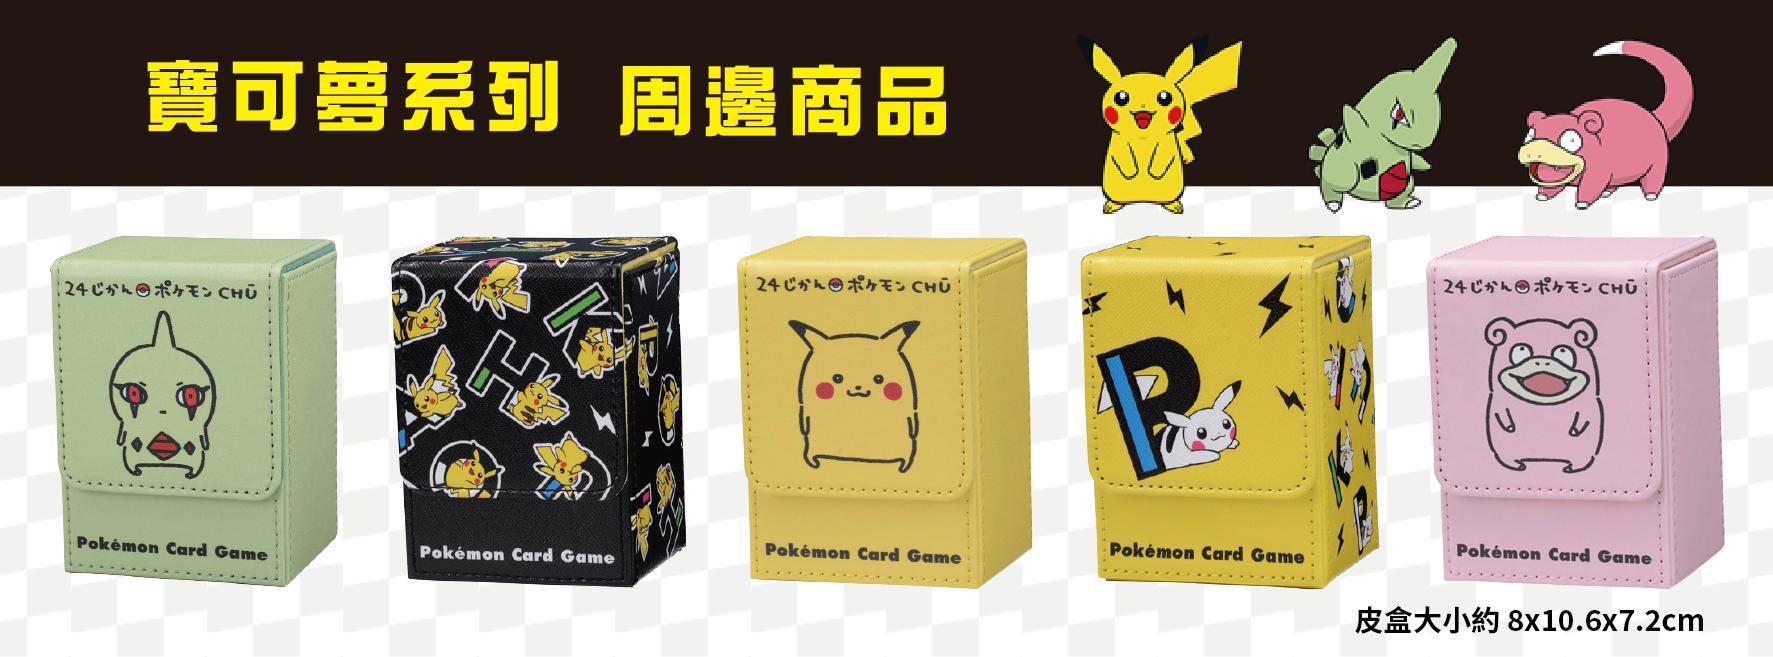 >寶可夢中心Pokemon Center - HobbyToy 哈玩具